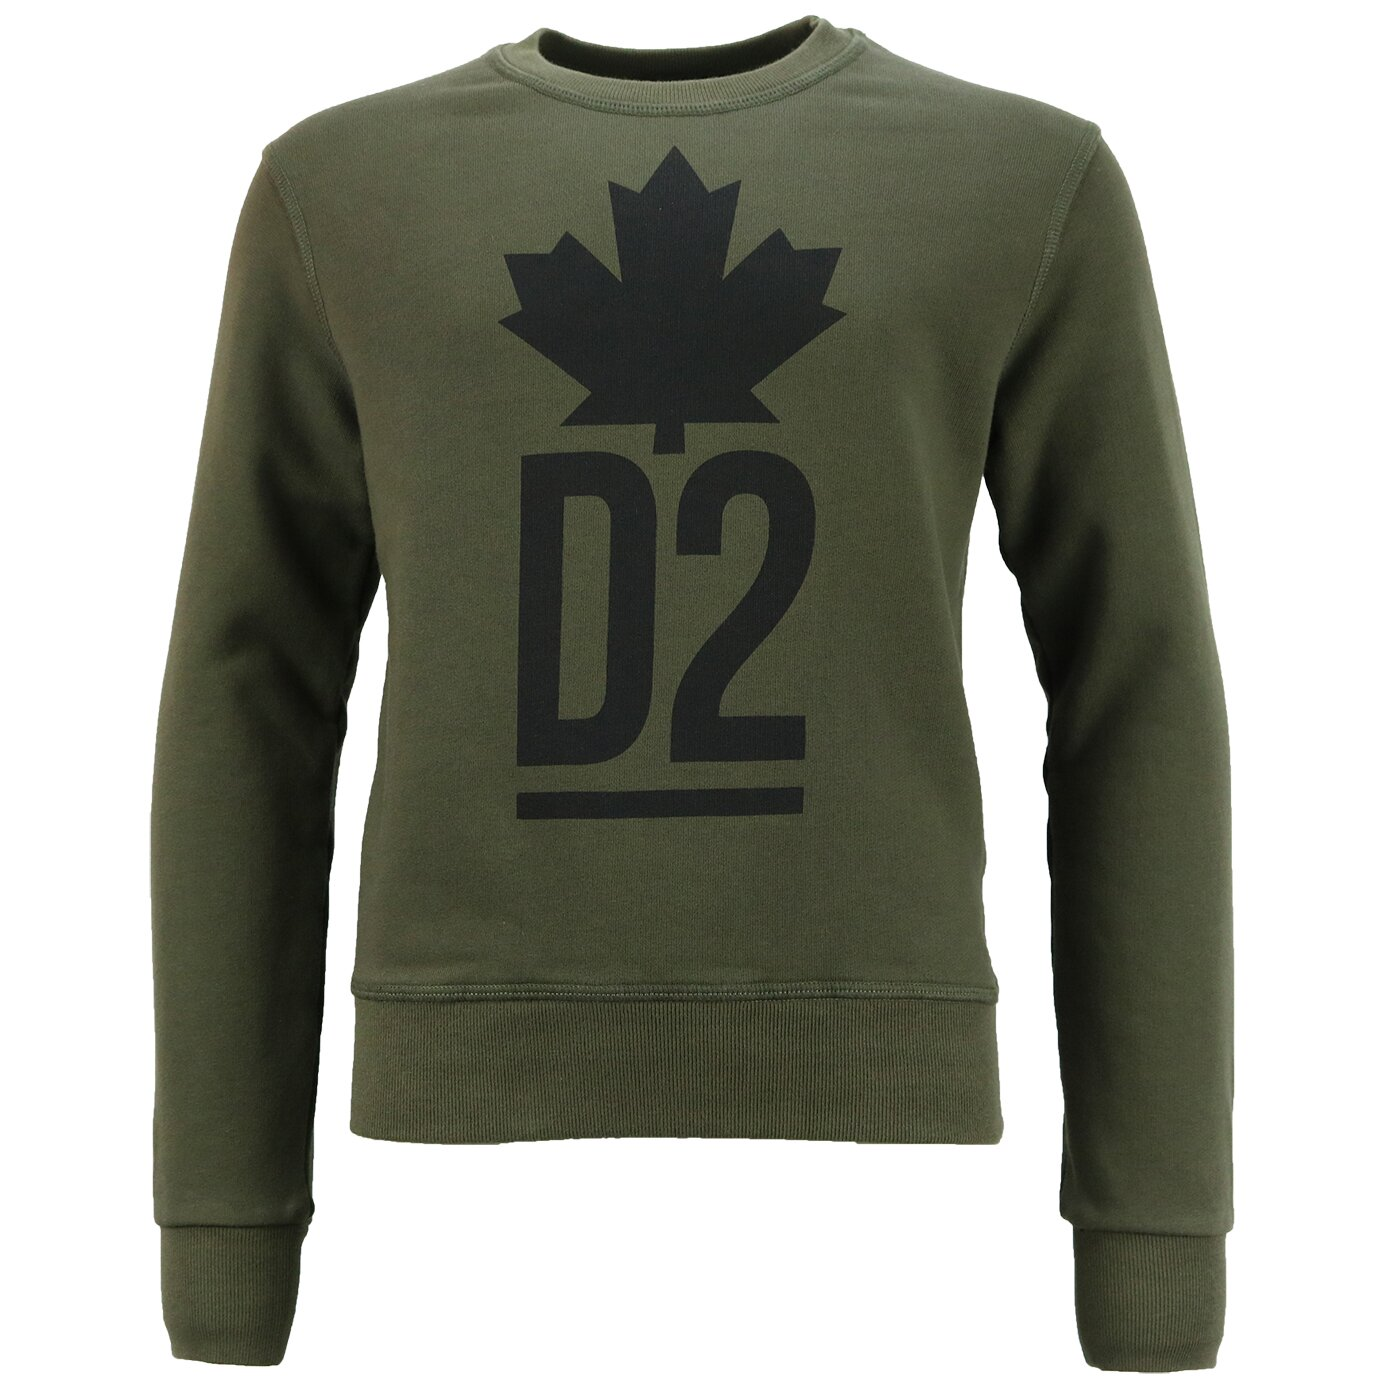 Dsquared2 Sweater Groen Maple Leaf